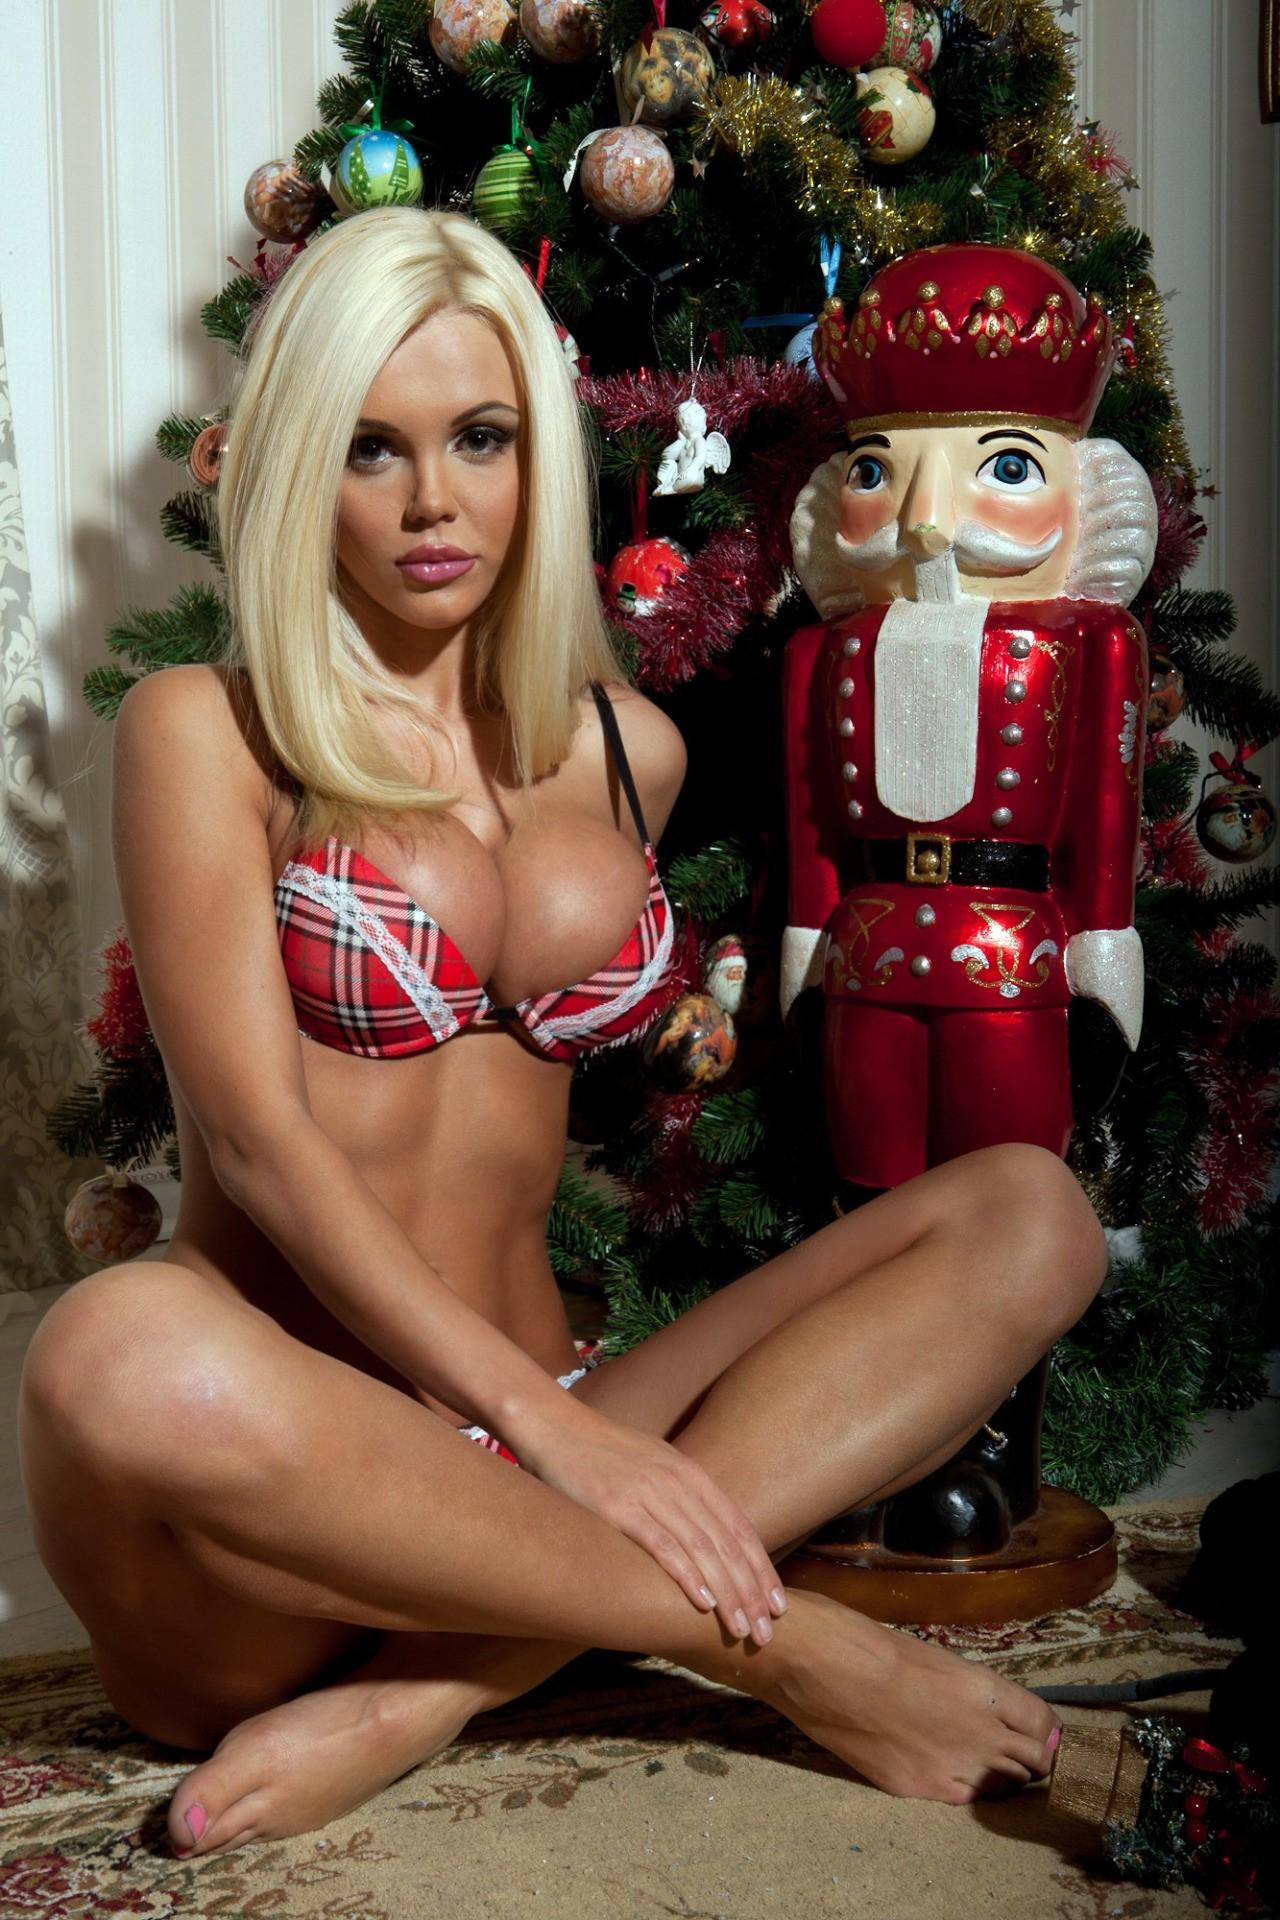 Pity, santa big boobs were visited